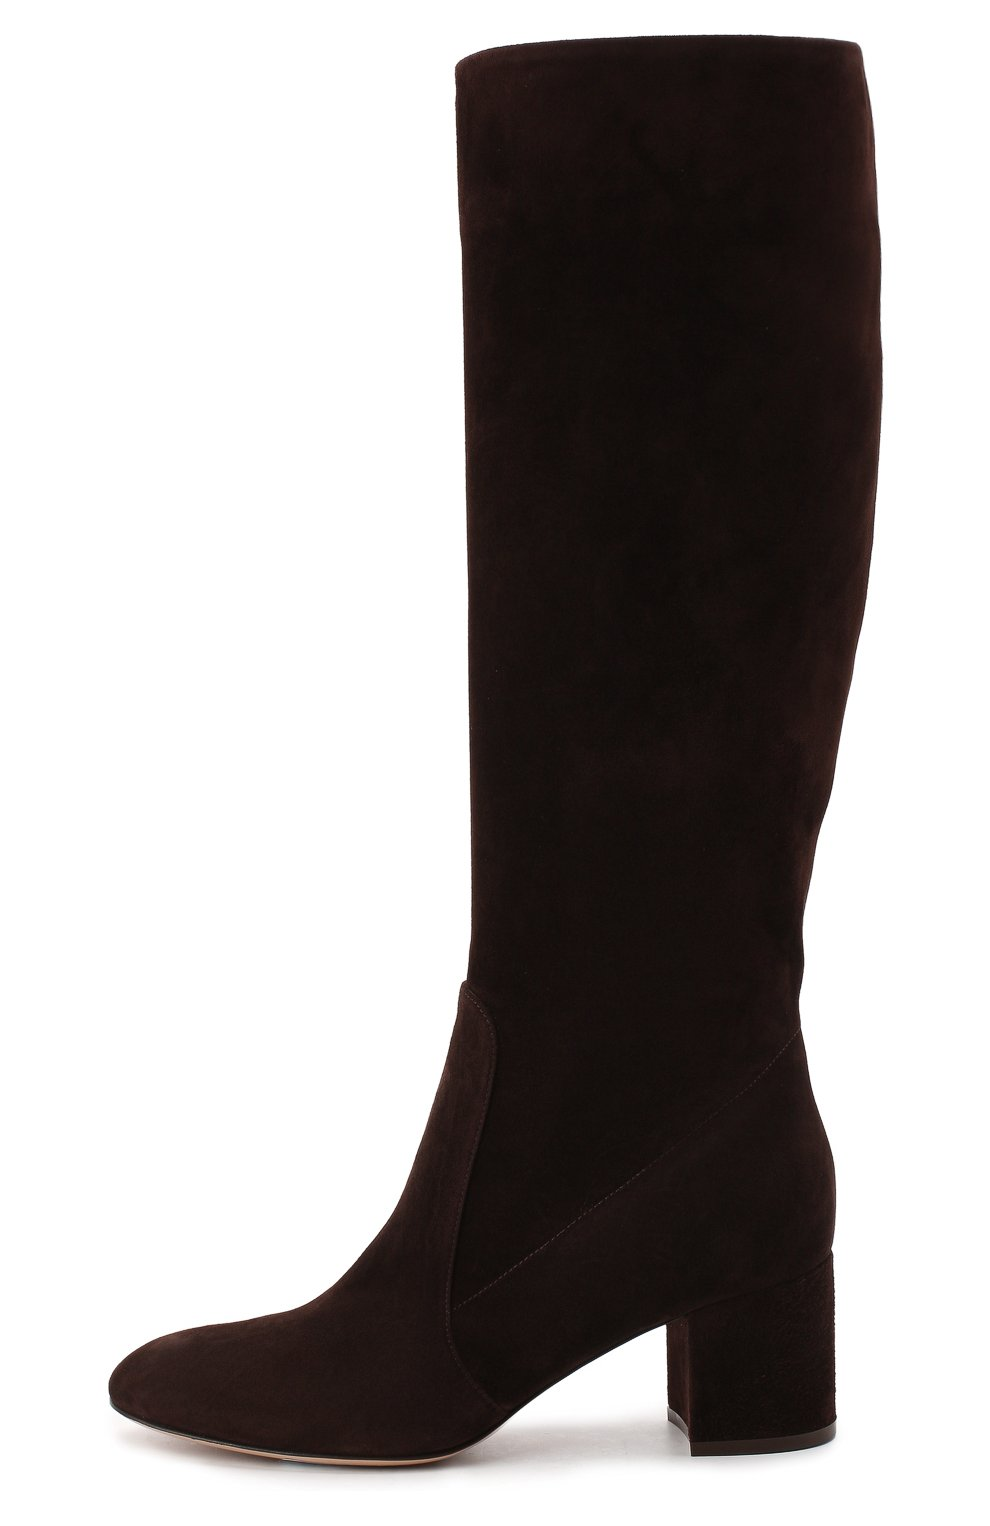 Женские замшевые сапоги daywear GIANVITO ROSSI коричневого цвета, арт. G80401.60RIC.C45W00D | Фото 3